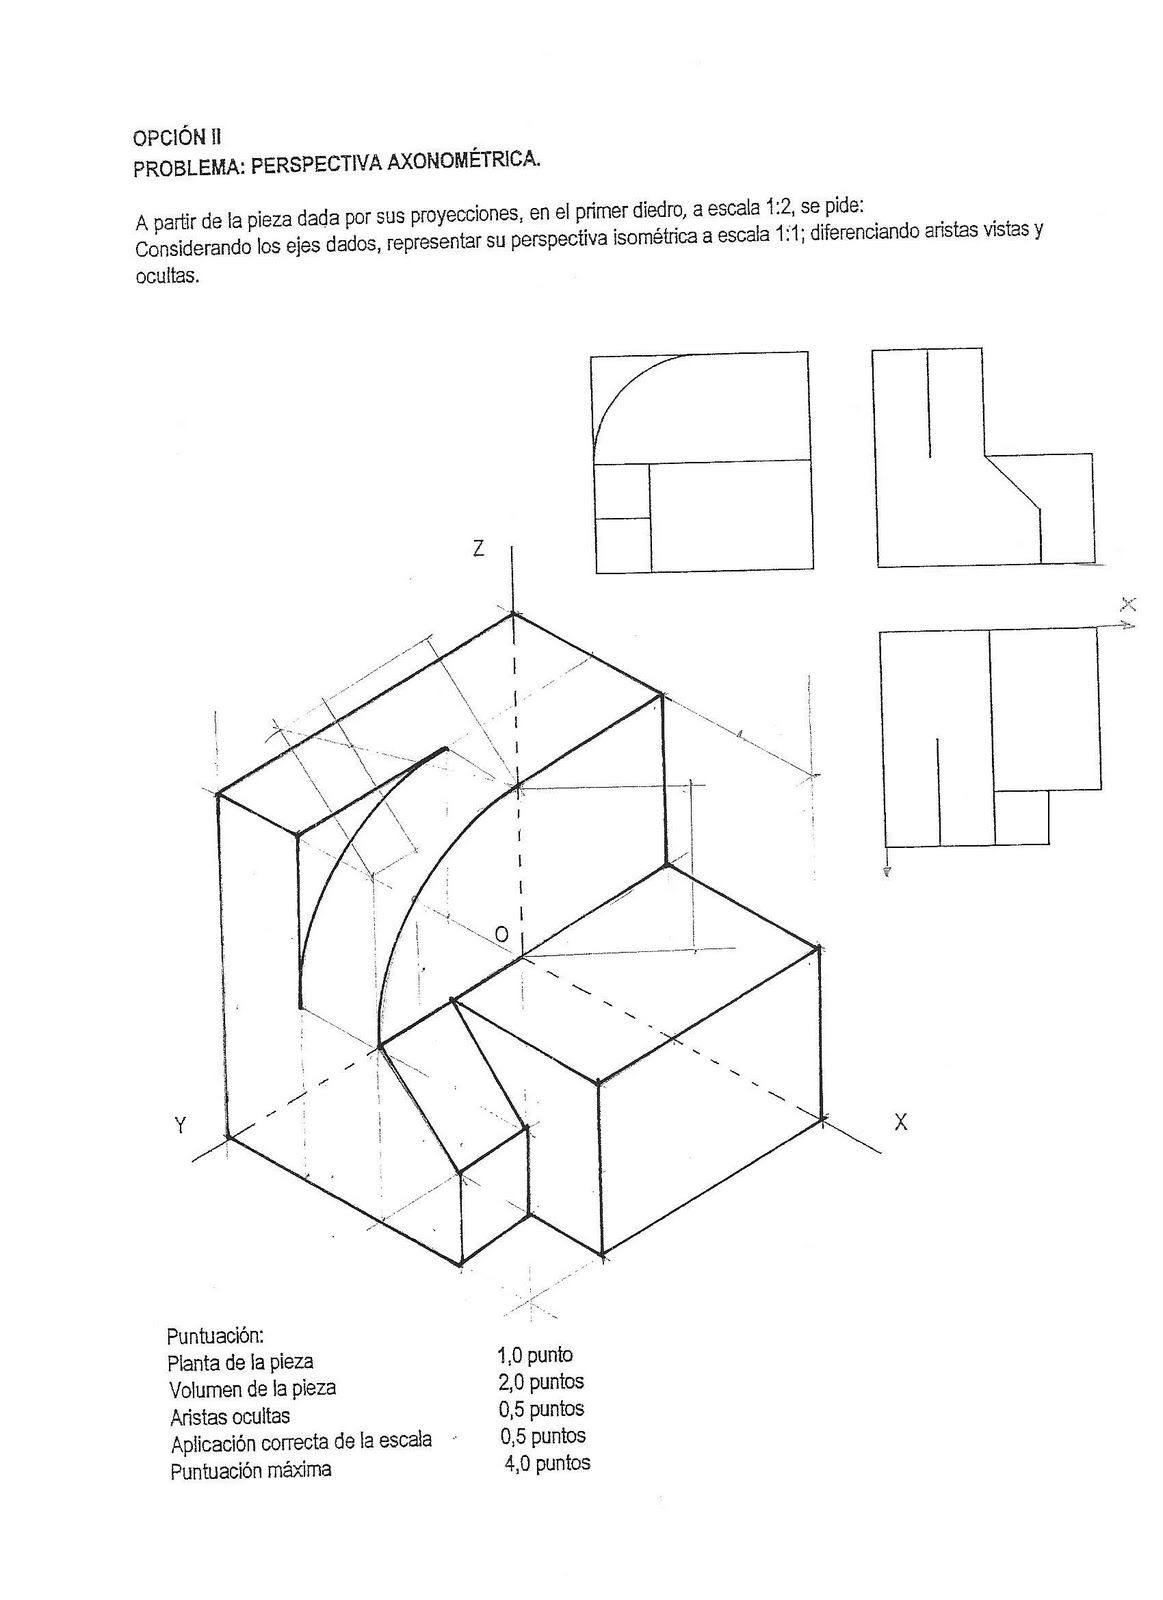 Imagen De Https I Pinimg Com Originals B7 7e Dd B77edd736c70d0e29ffcbf4d0fe67eda Jpg Vistas Dibujo Tecnico Tecnicas De Dibujo Dibujo Tecnico Ejercicios